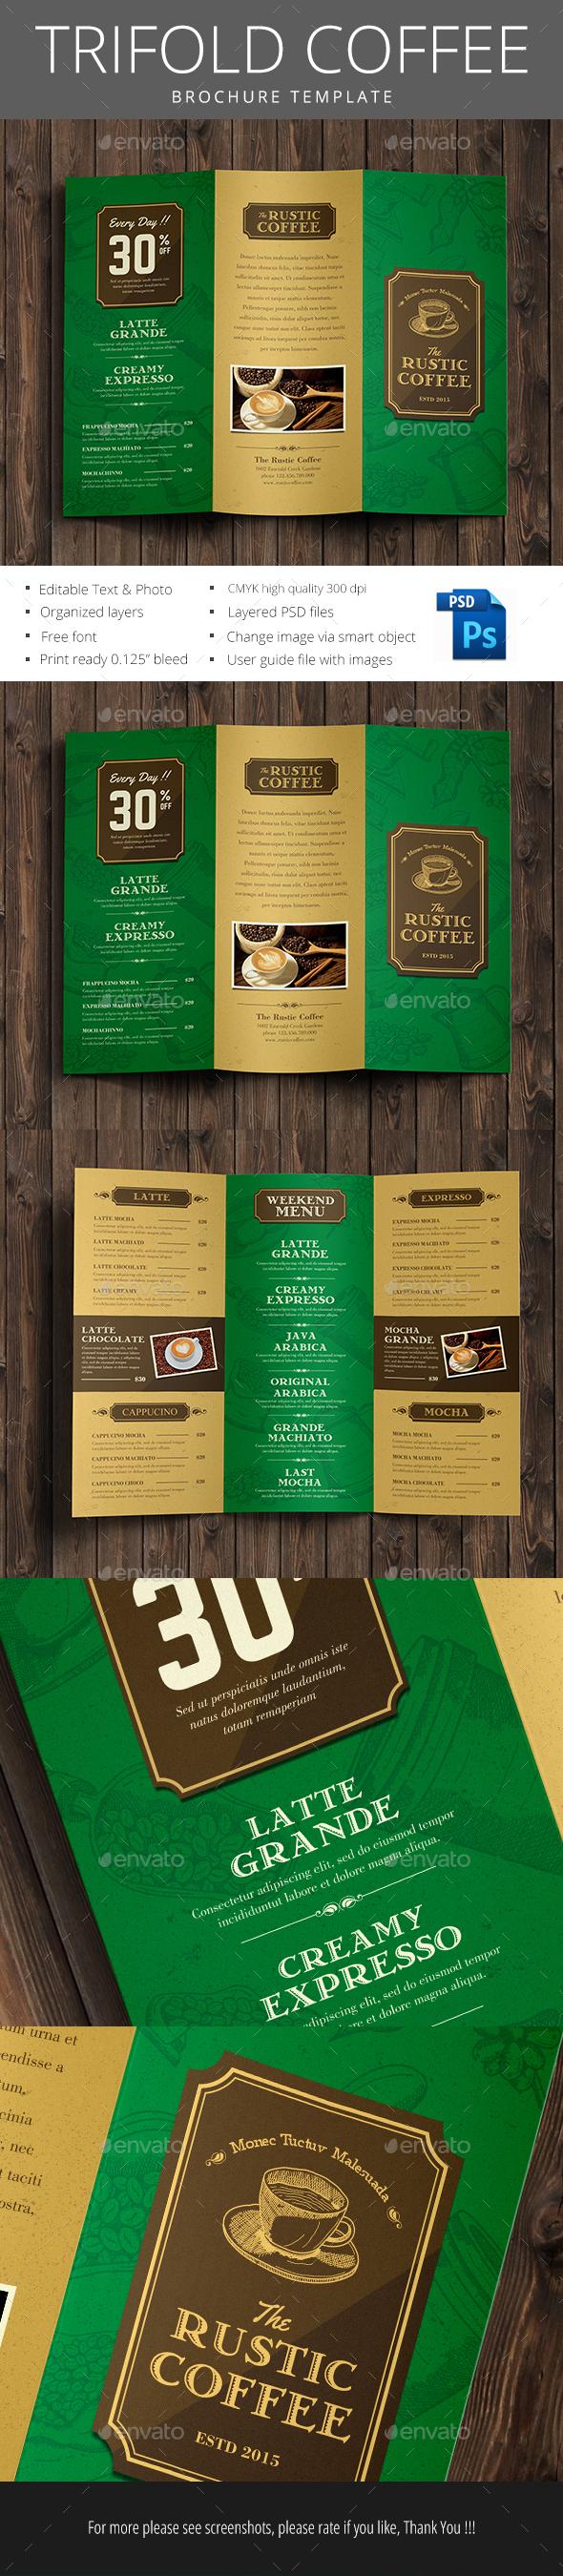 Tri Fold Coffee Brochure - Brochures Print Templates